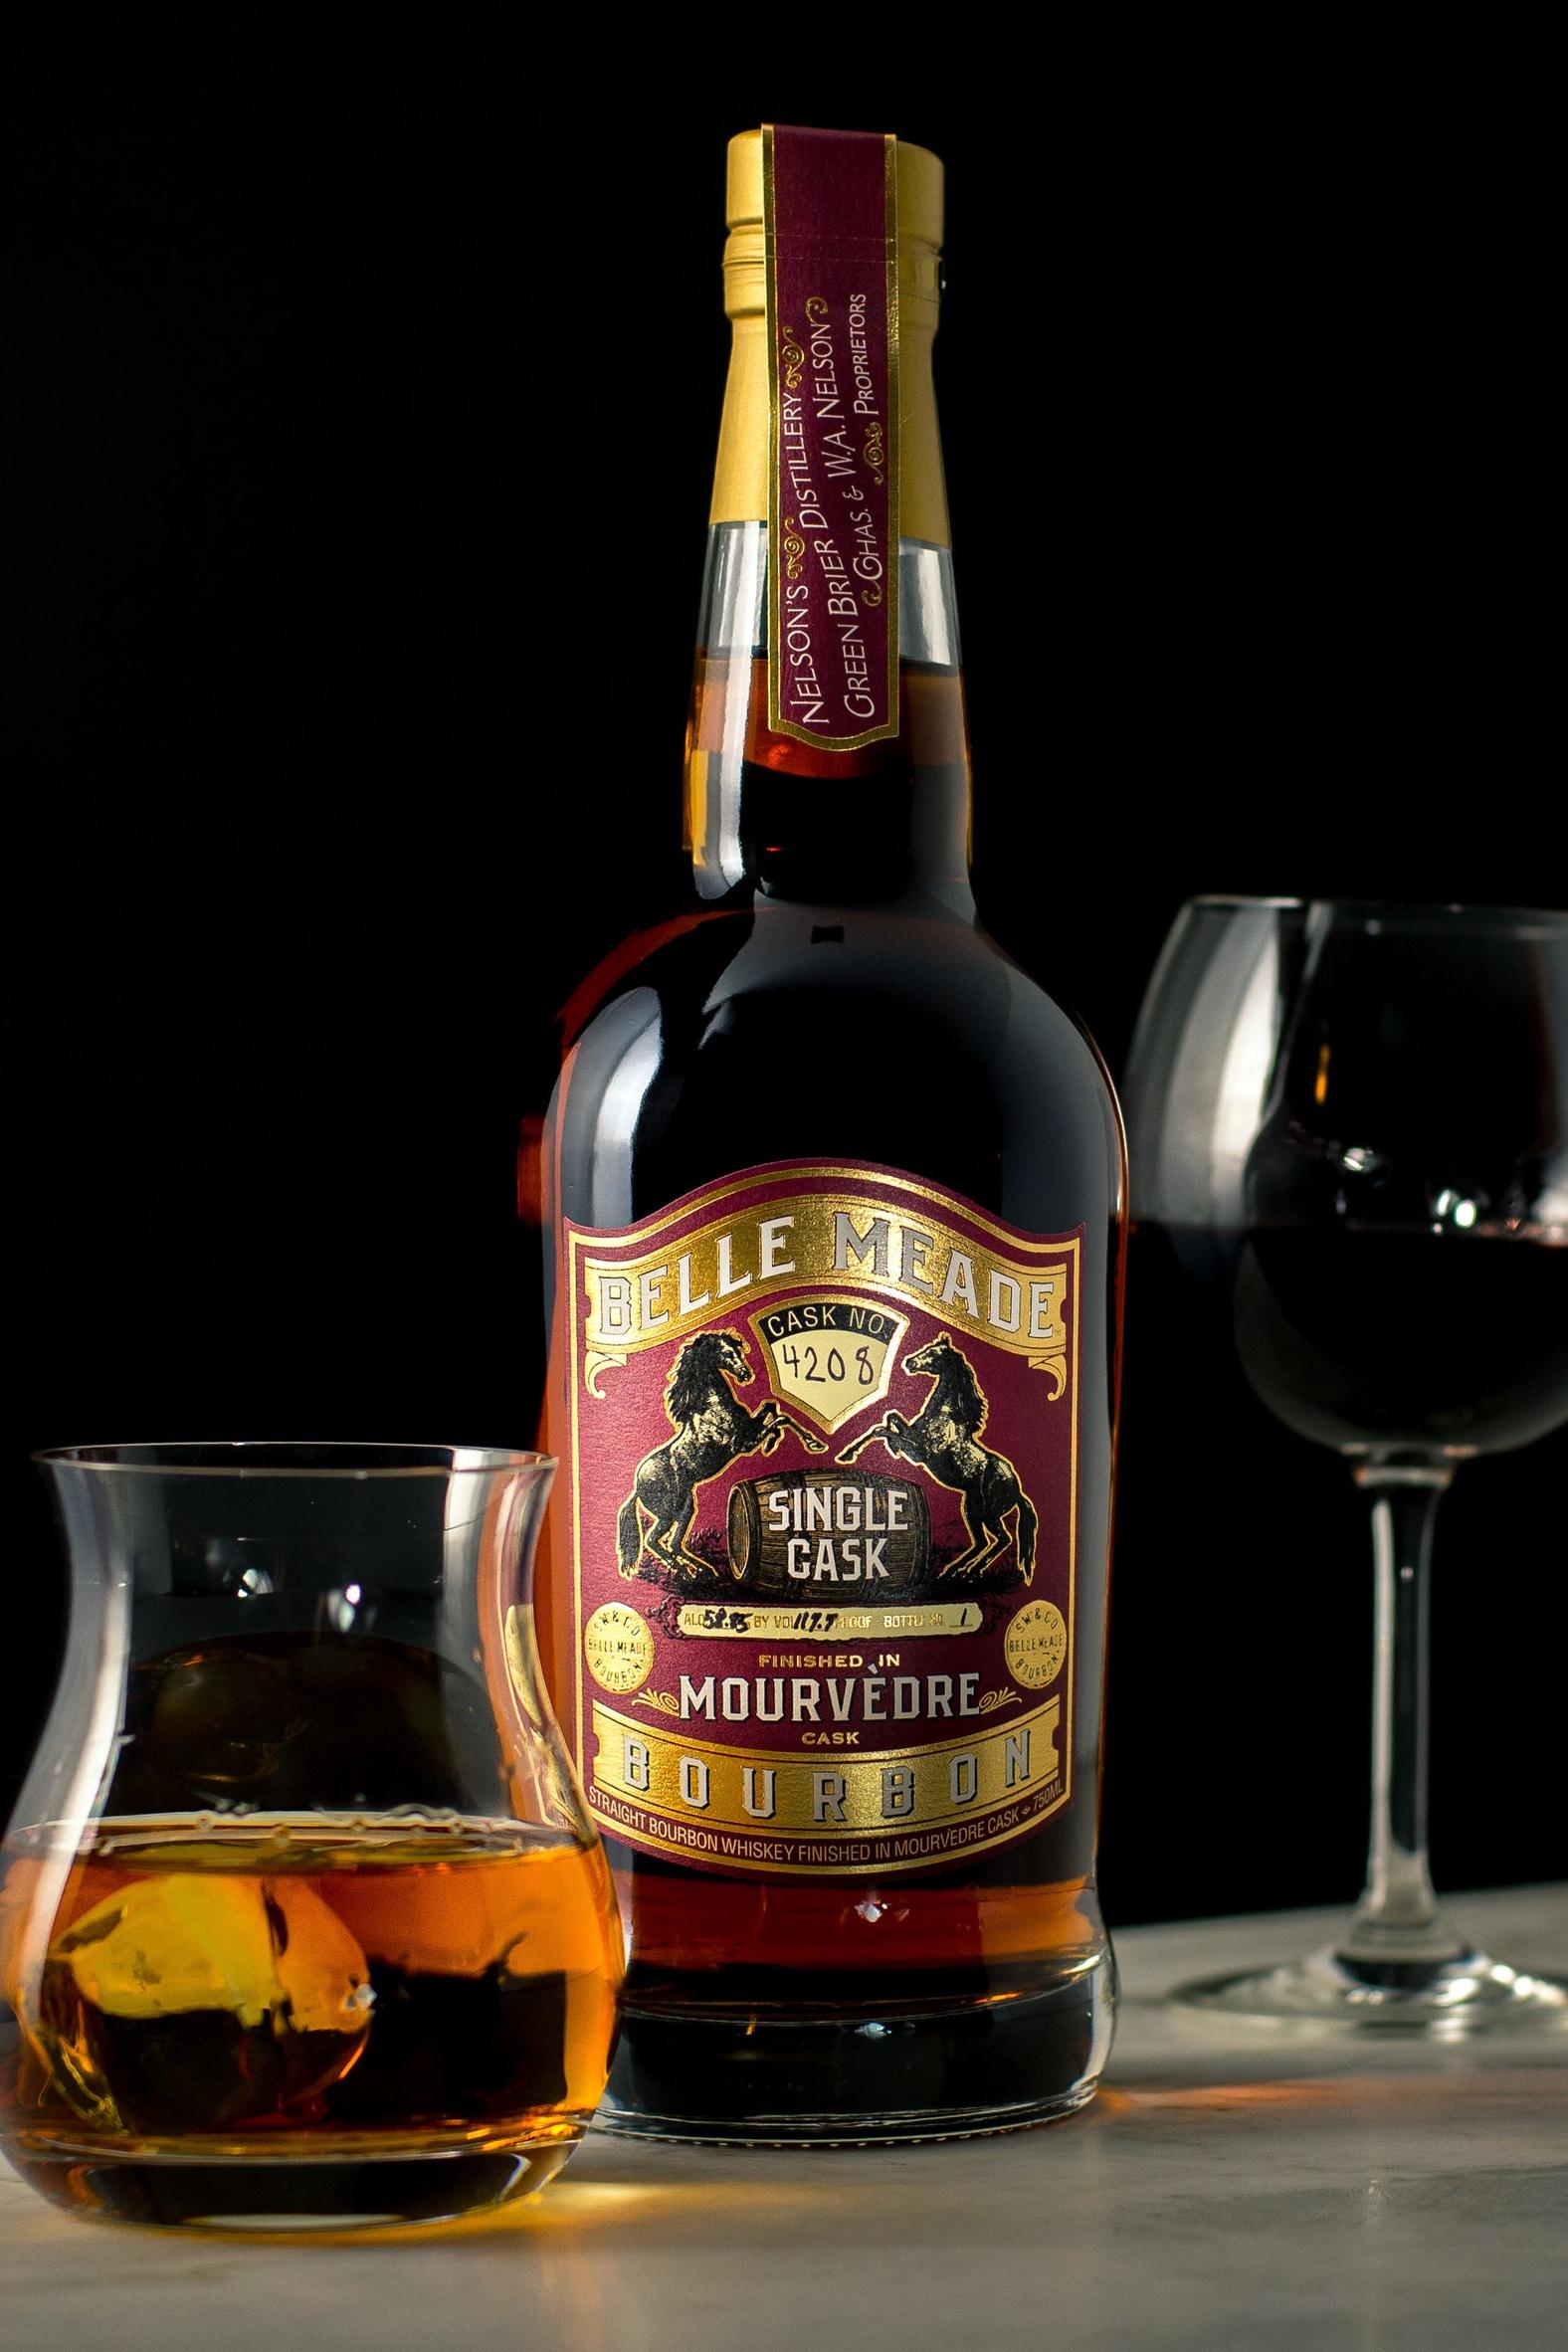 Belle Meade Bourbon Craftsman Cask Collection - Sixth Release | Mouverdre Cask Finish